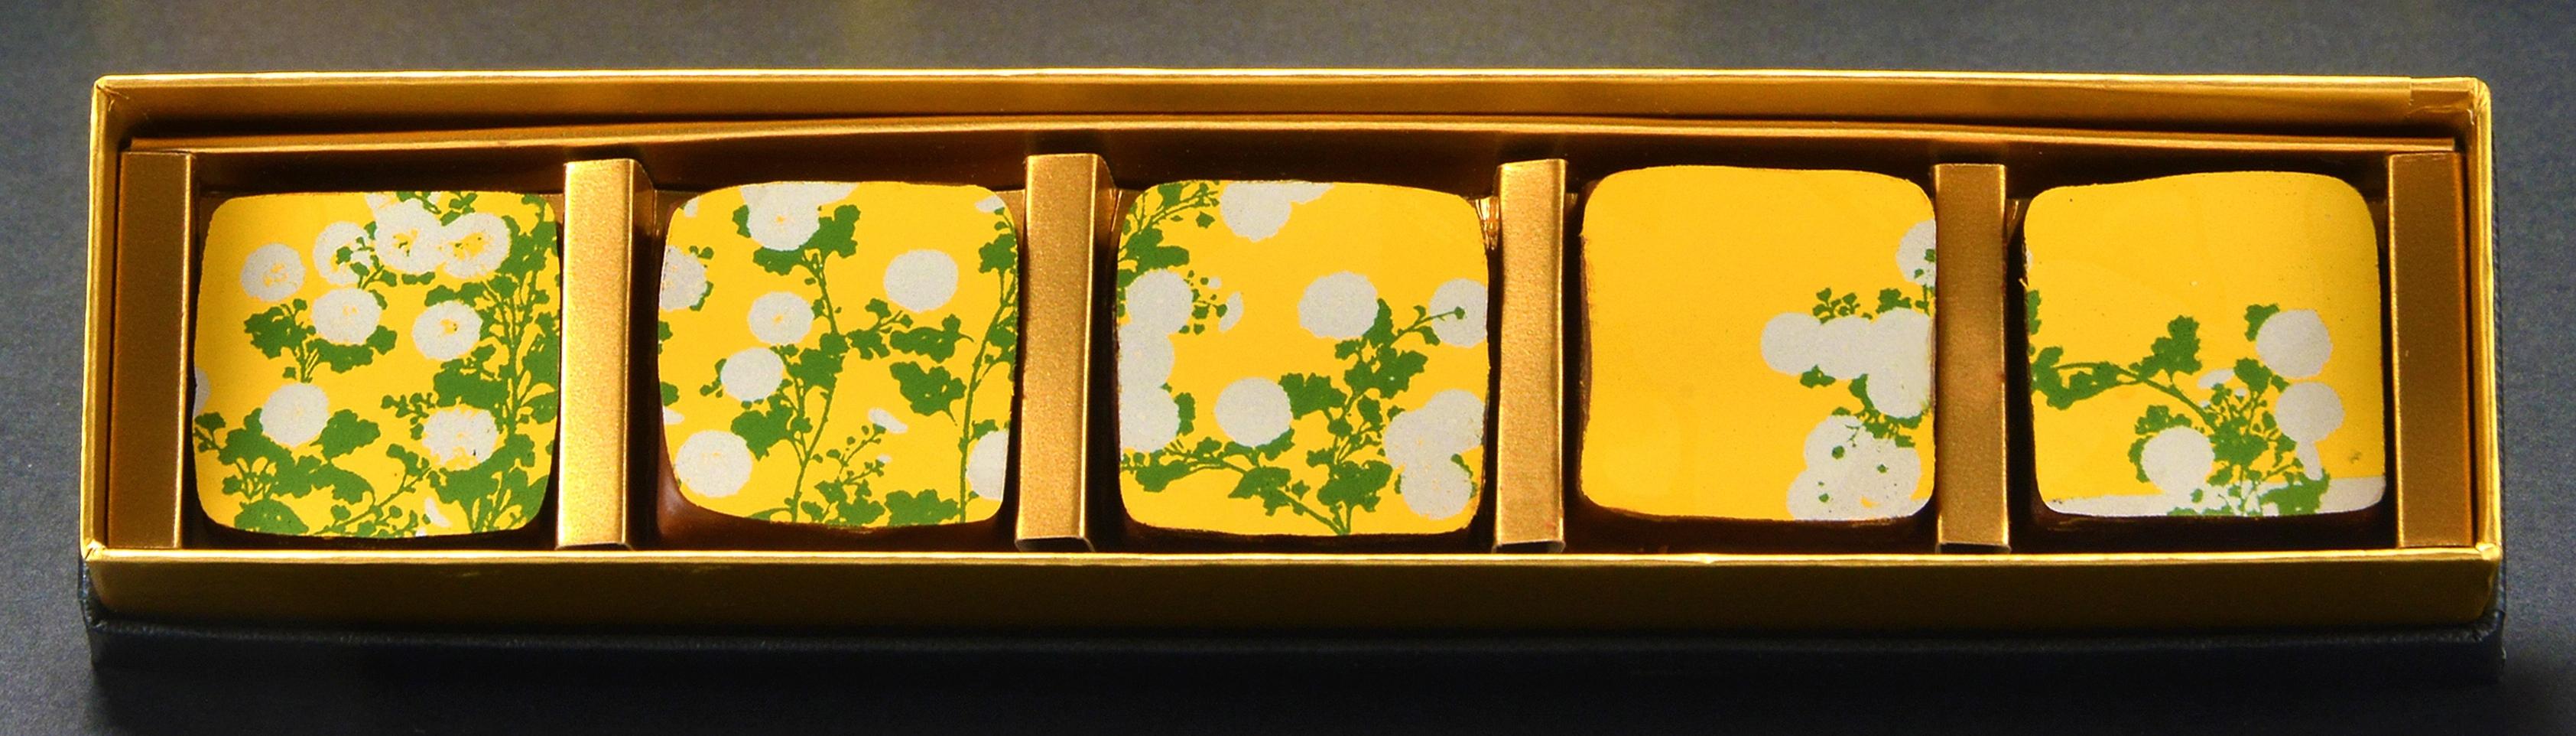 Okada Museum Chocolate 『光琳・菊』2,800 円(税込)